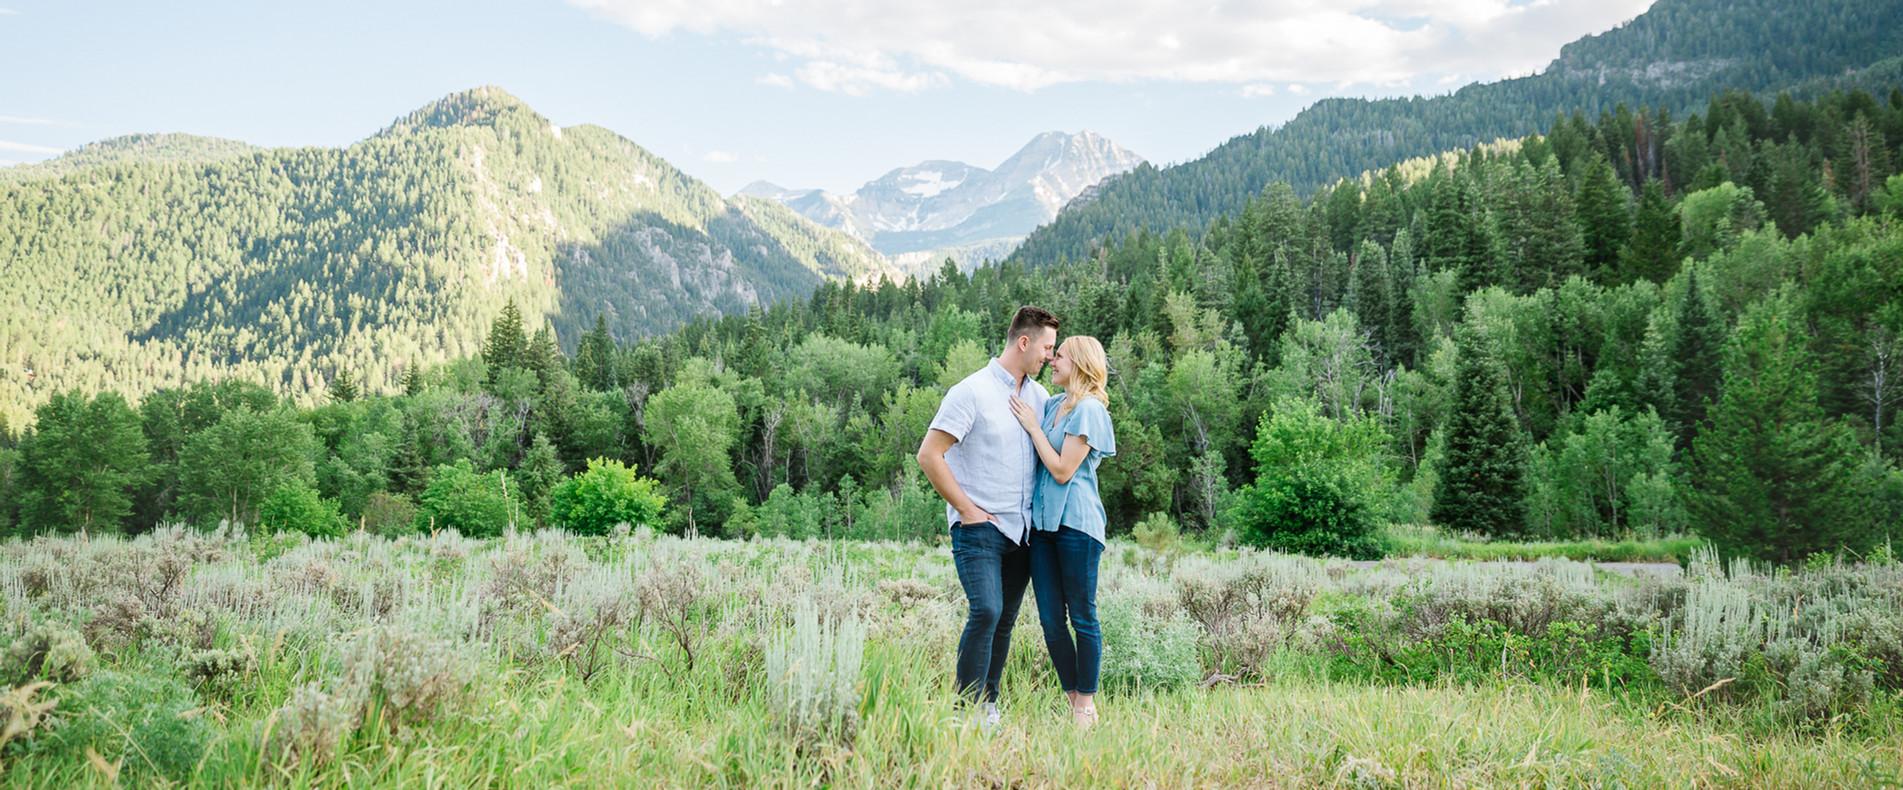 Mountain Engagement Picture Utah